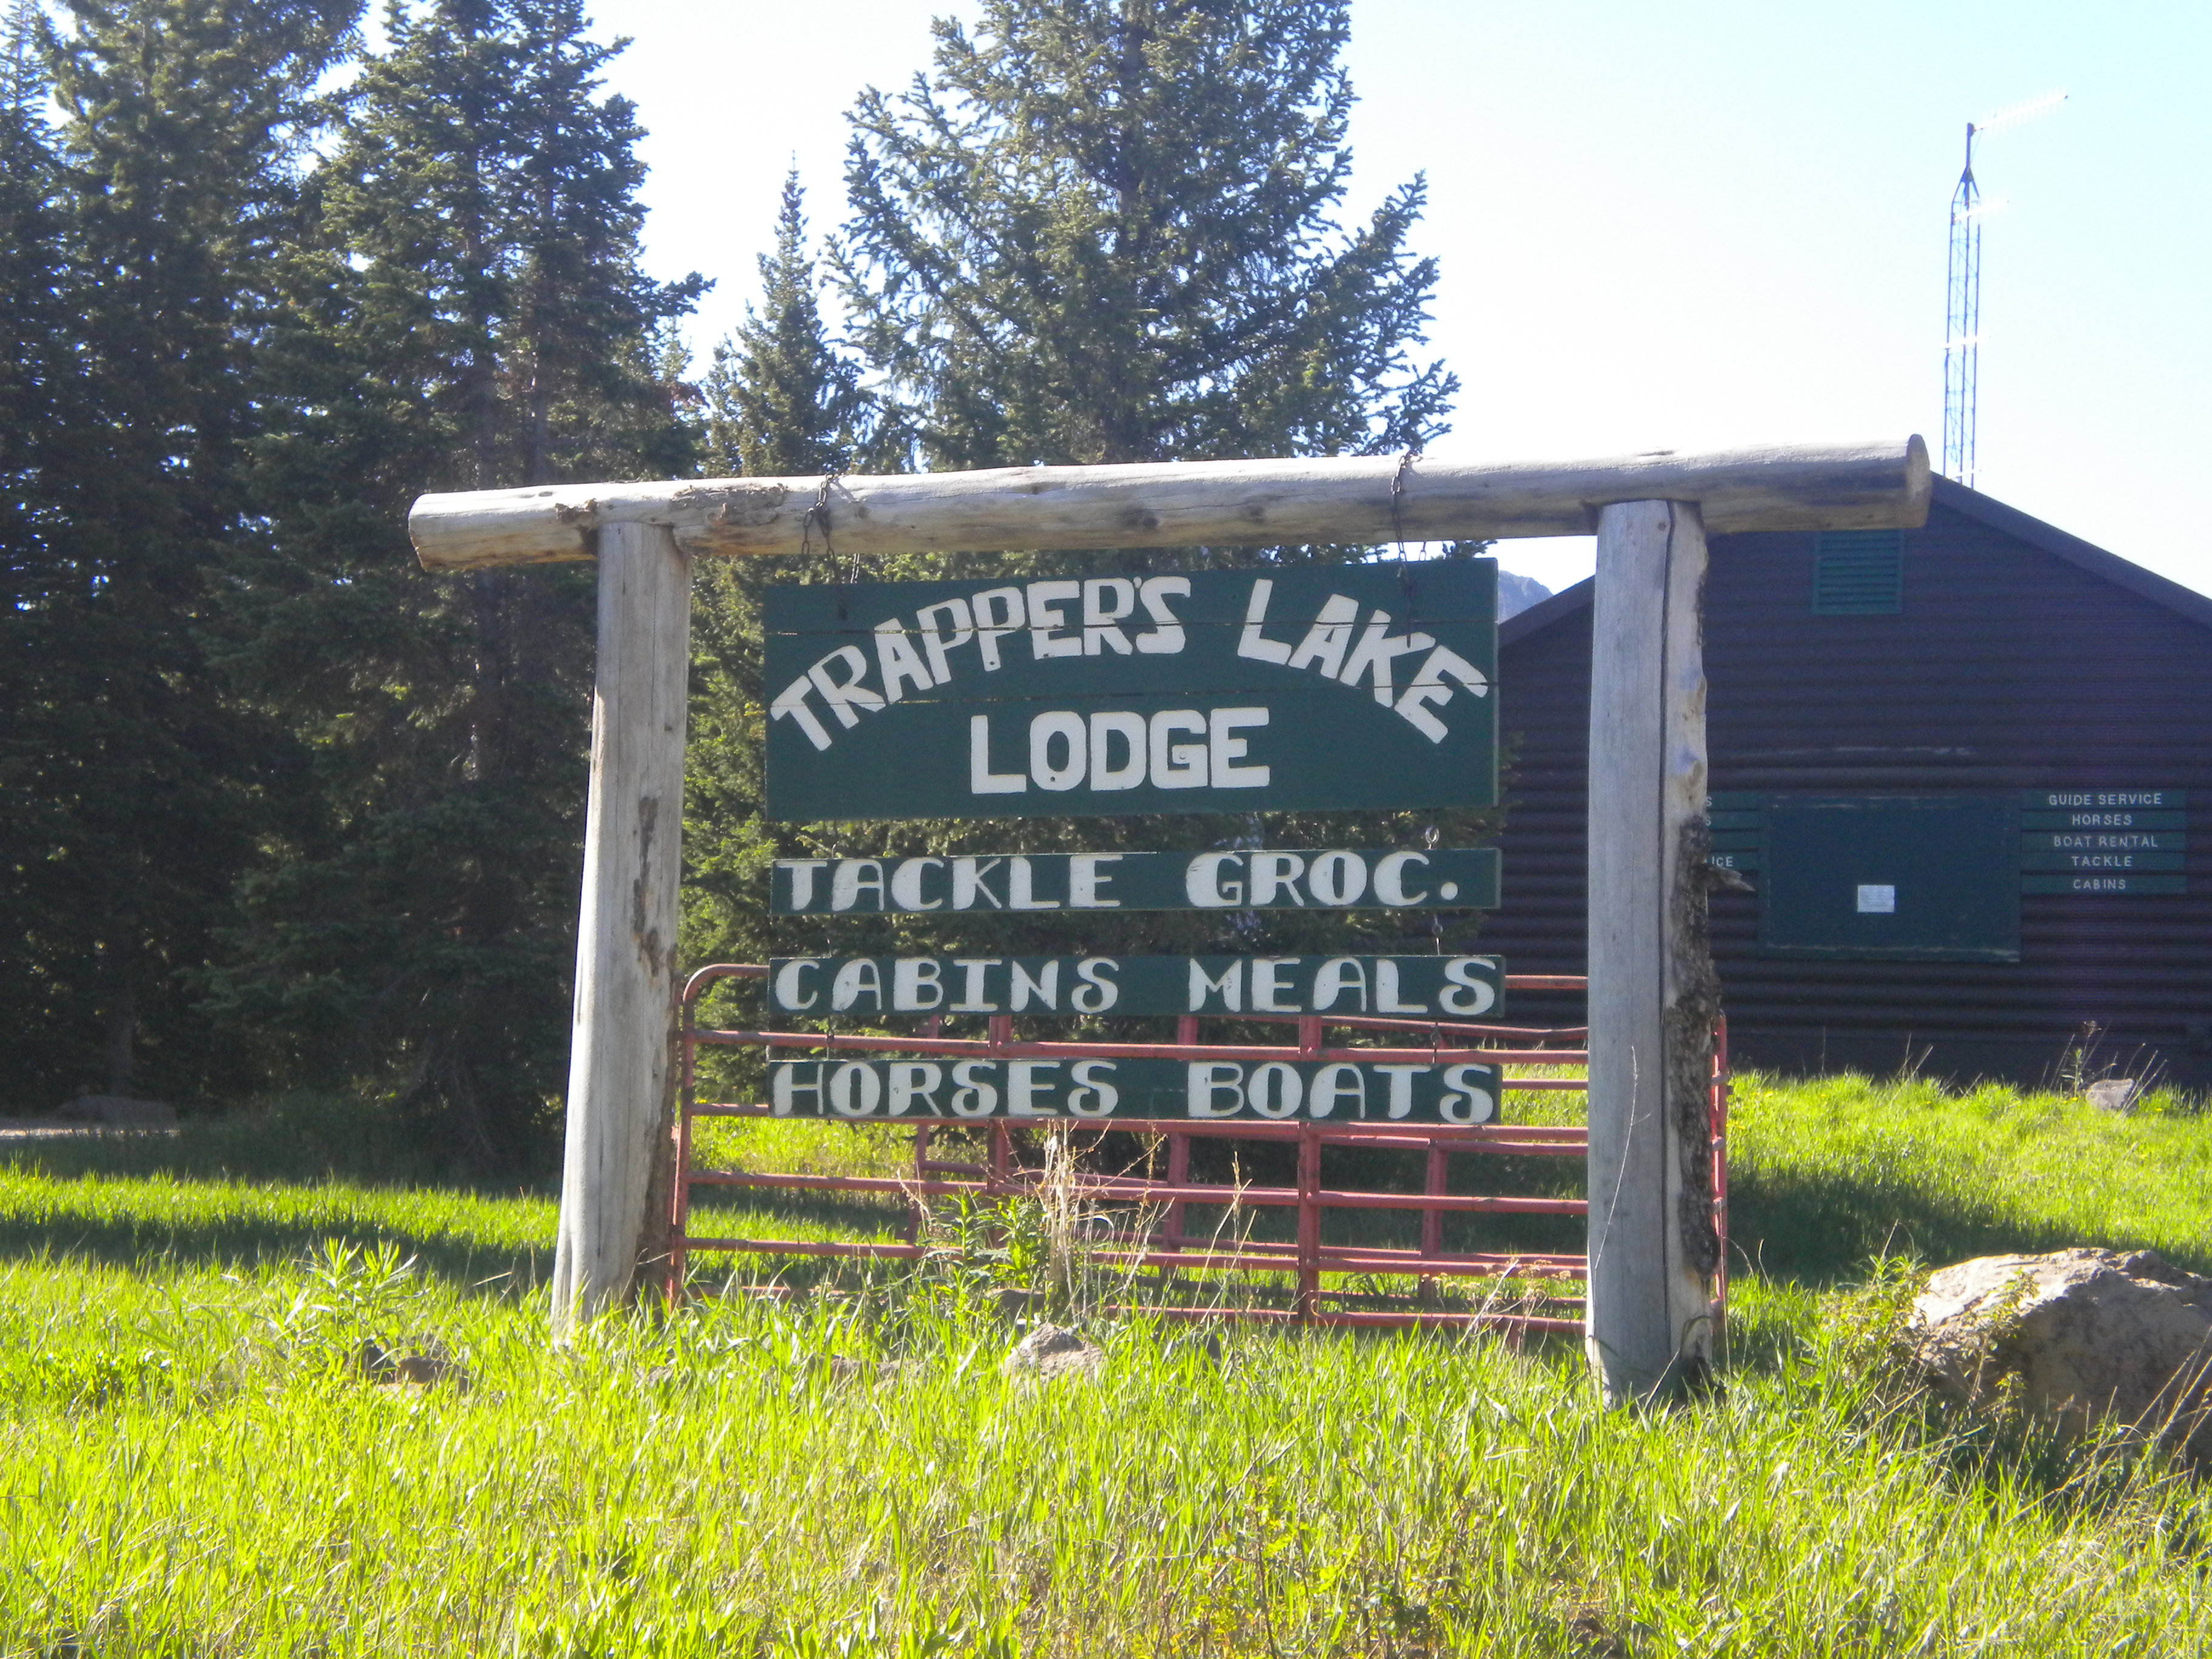 Trappers Lake Lodge & Resort